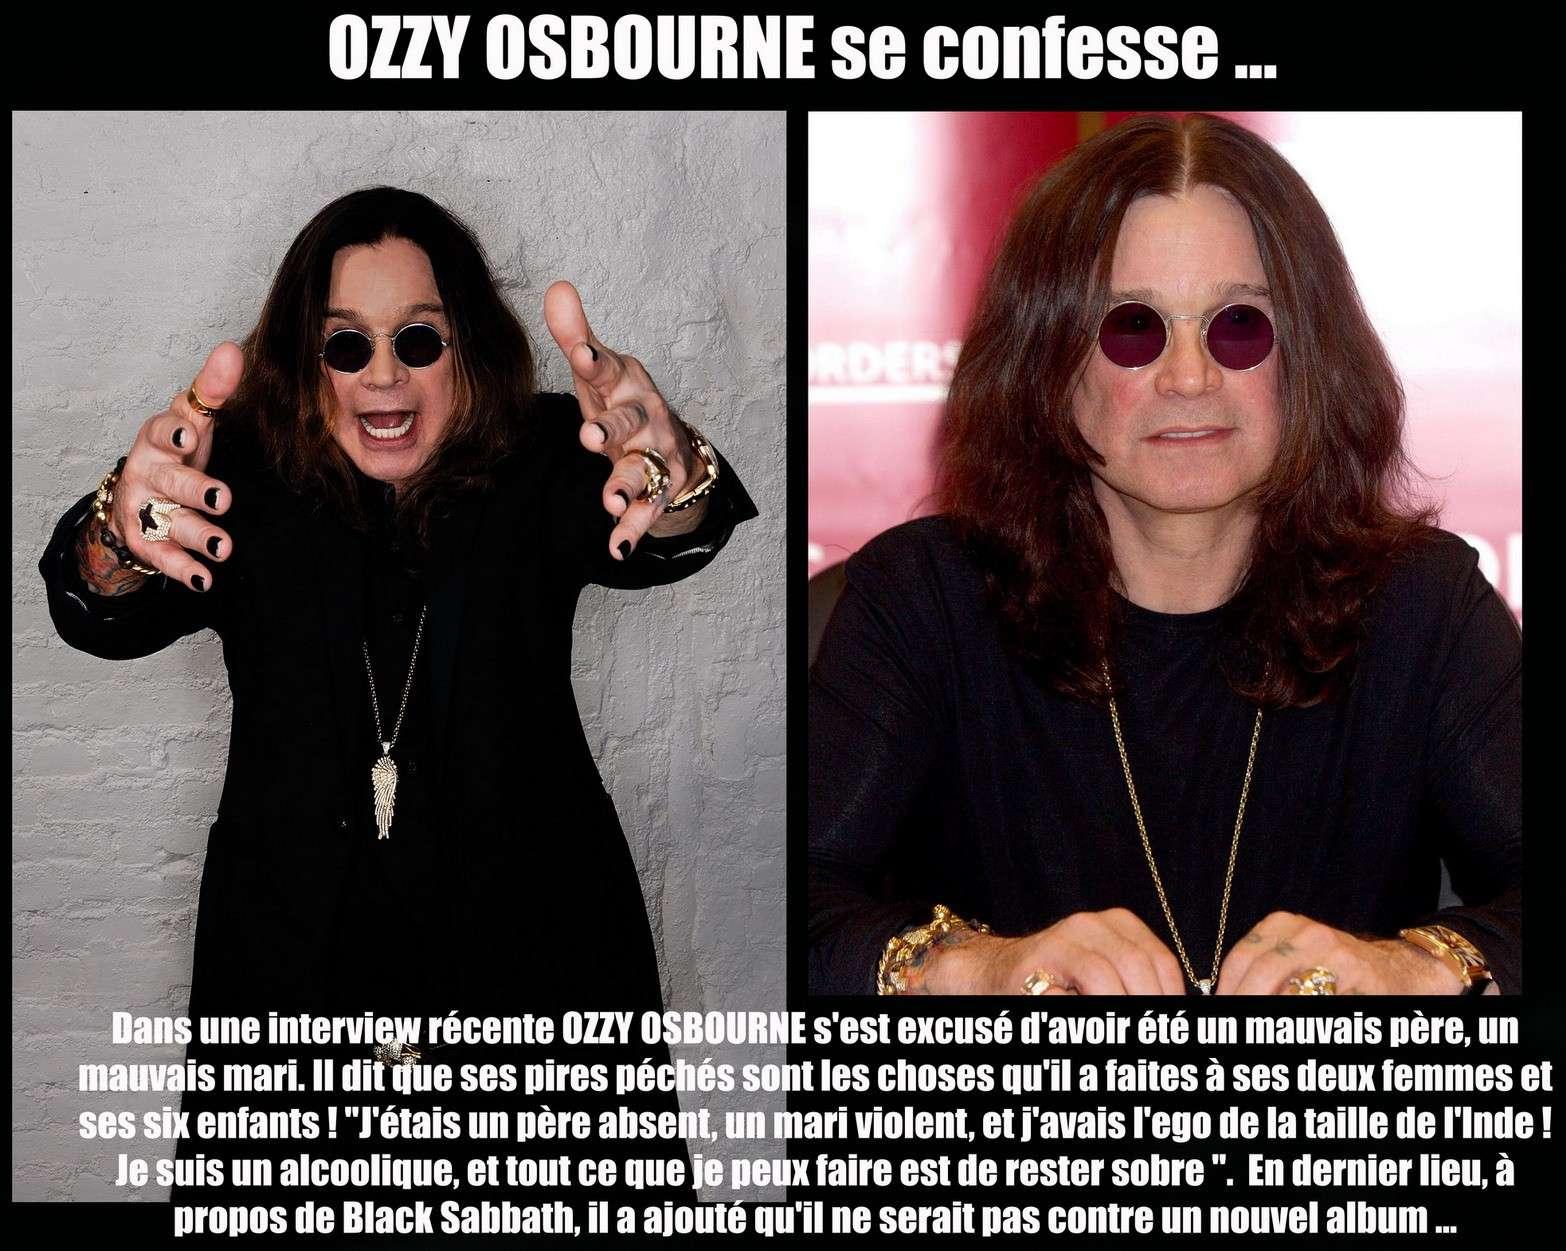 Les NEWS du METAL en VRAC ... - Page 4 Ozzy_o11